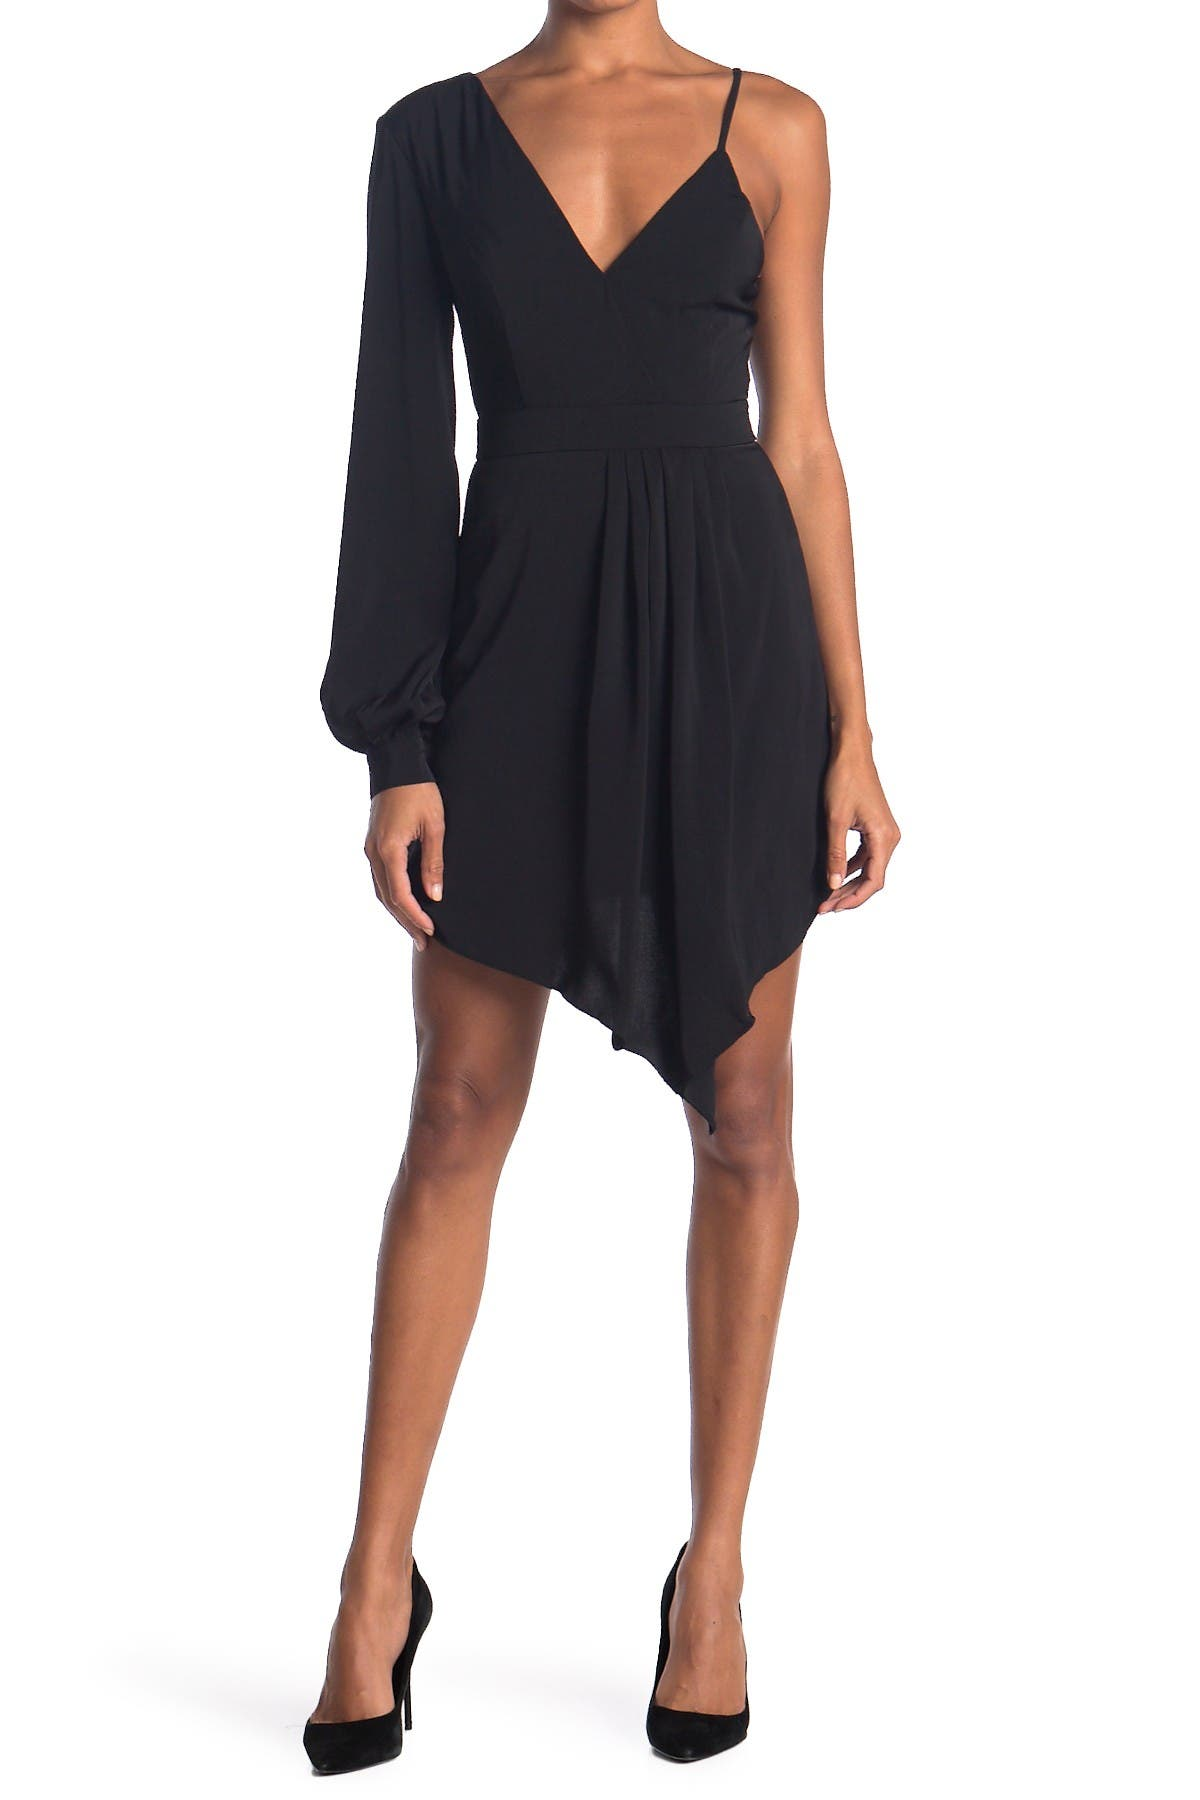 Do + Be One-Shoulder Asymmetrical Dress